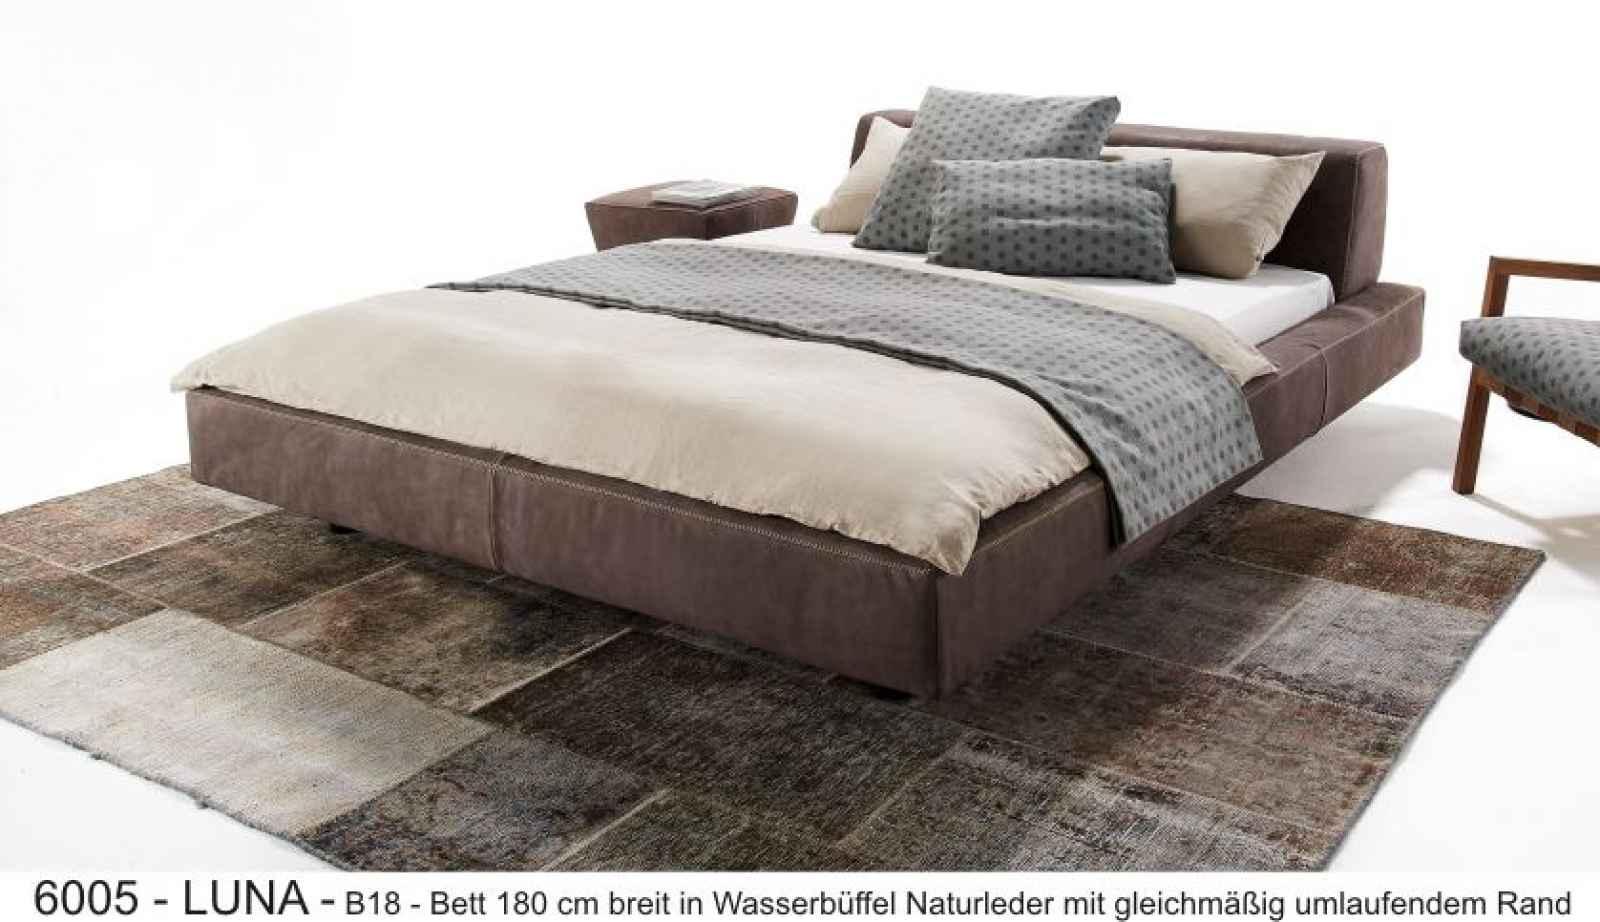 Betten, Matratzen, Lattenroste   The Lounge Company, Hause Deko